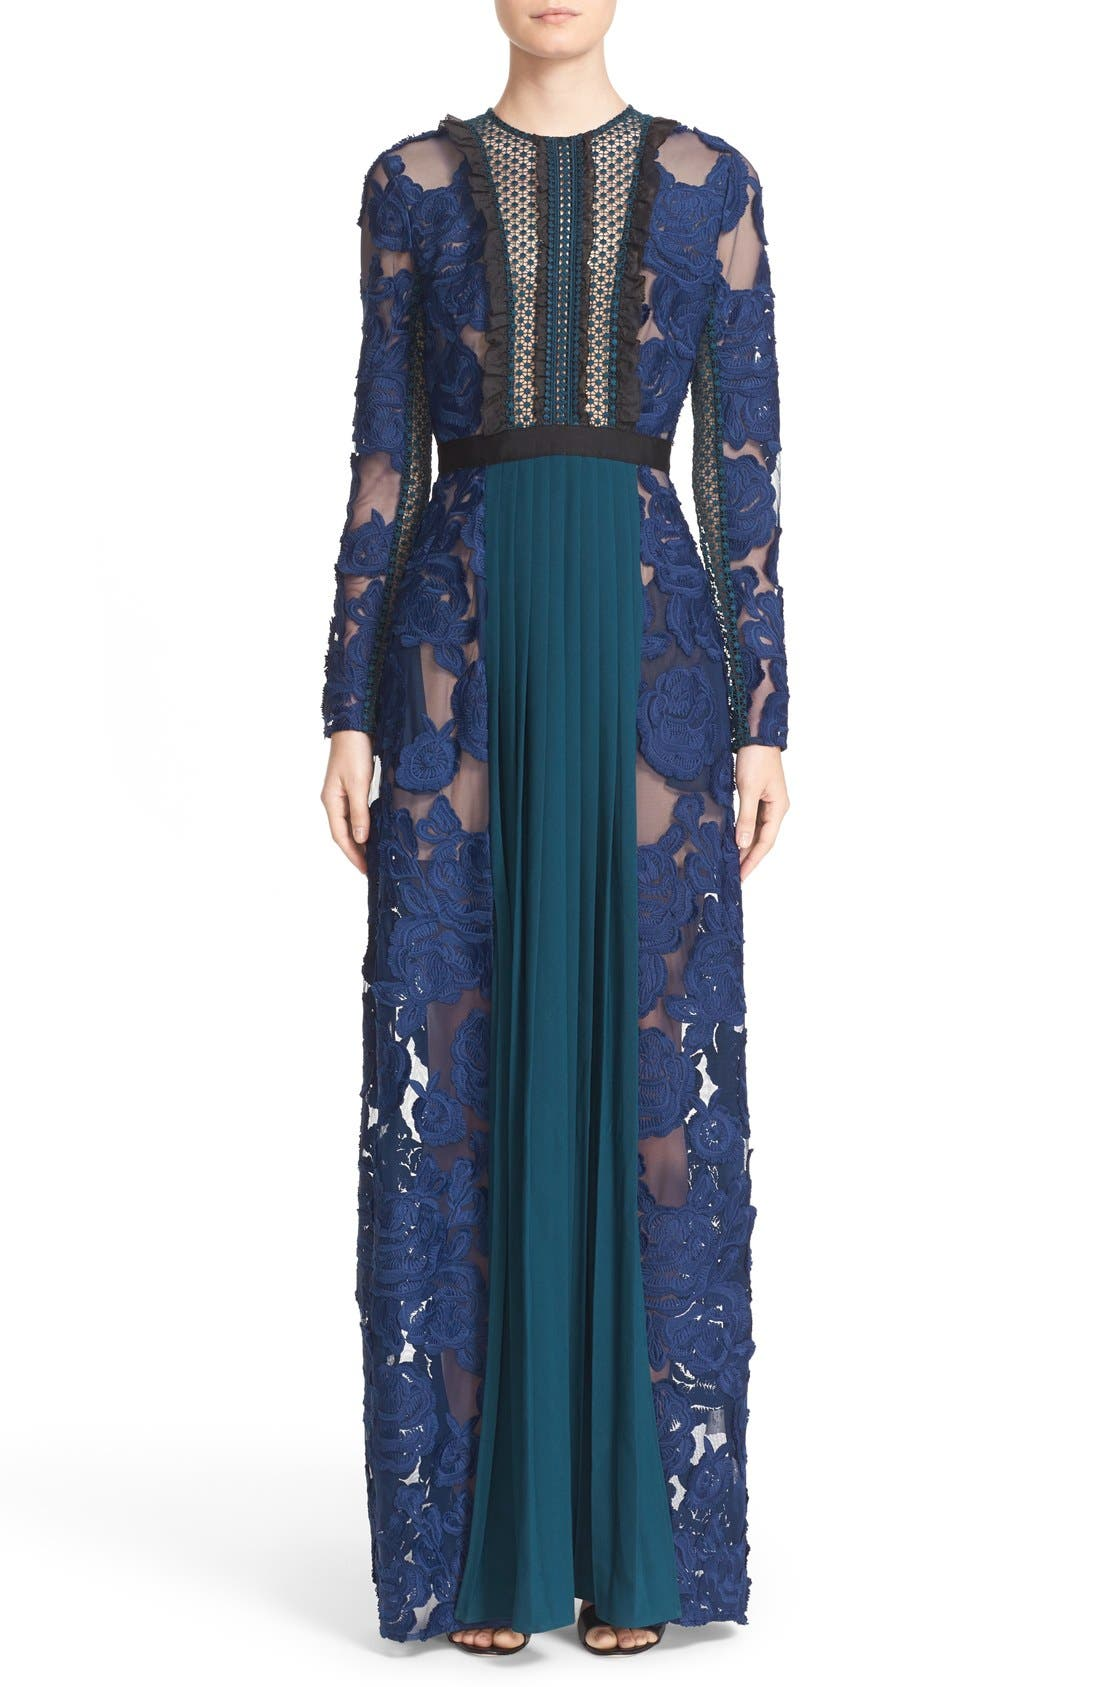 Main Image - Self-Portrait 'Thea' Lace & Crepe Maxi Dress